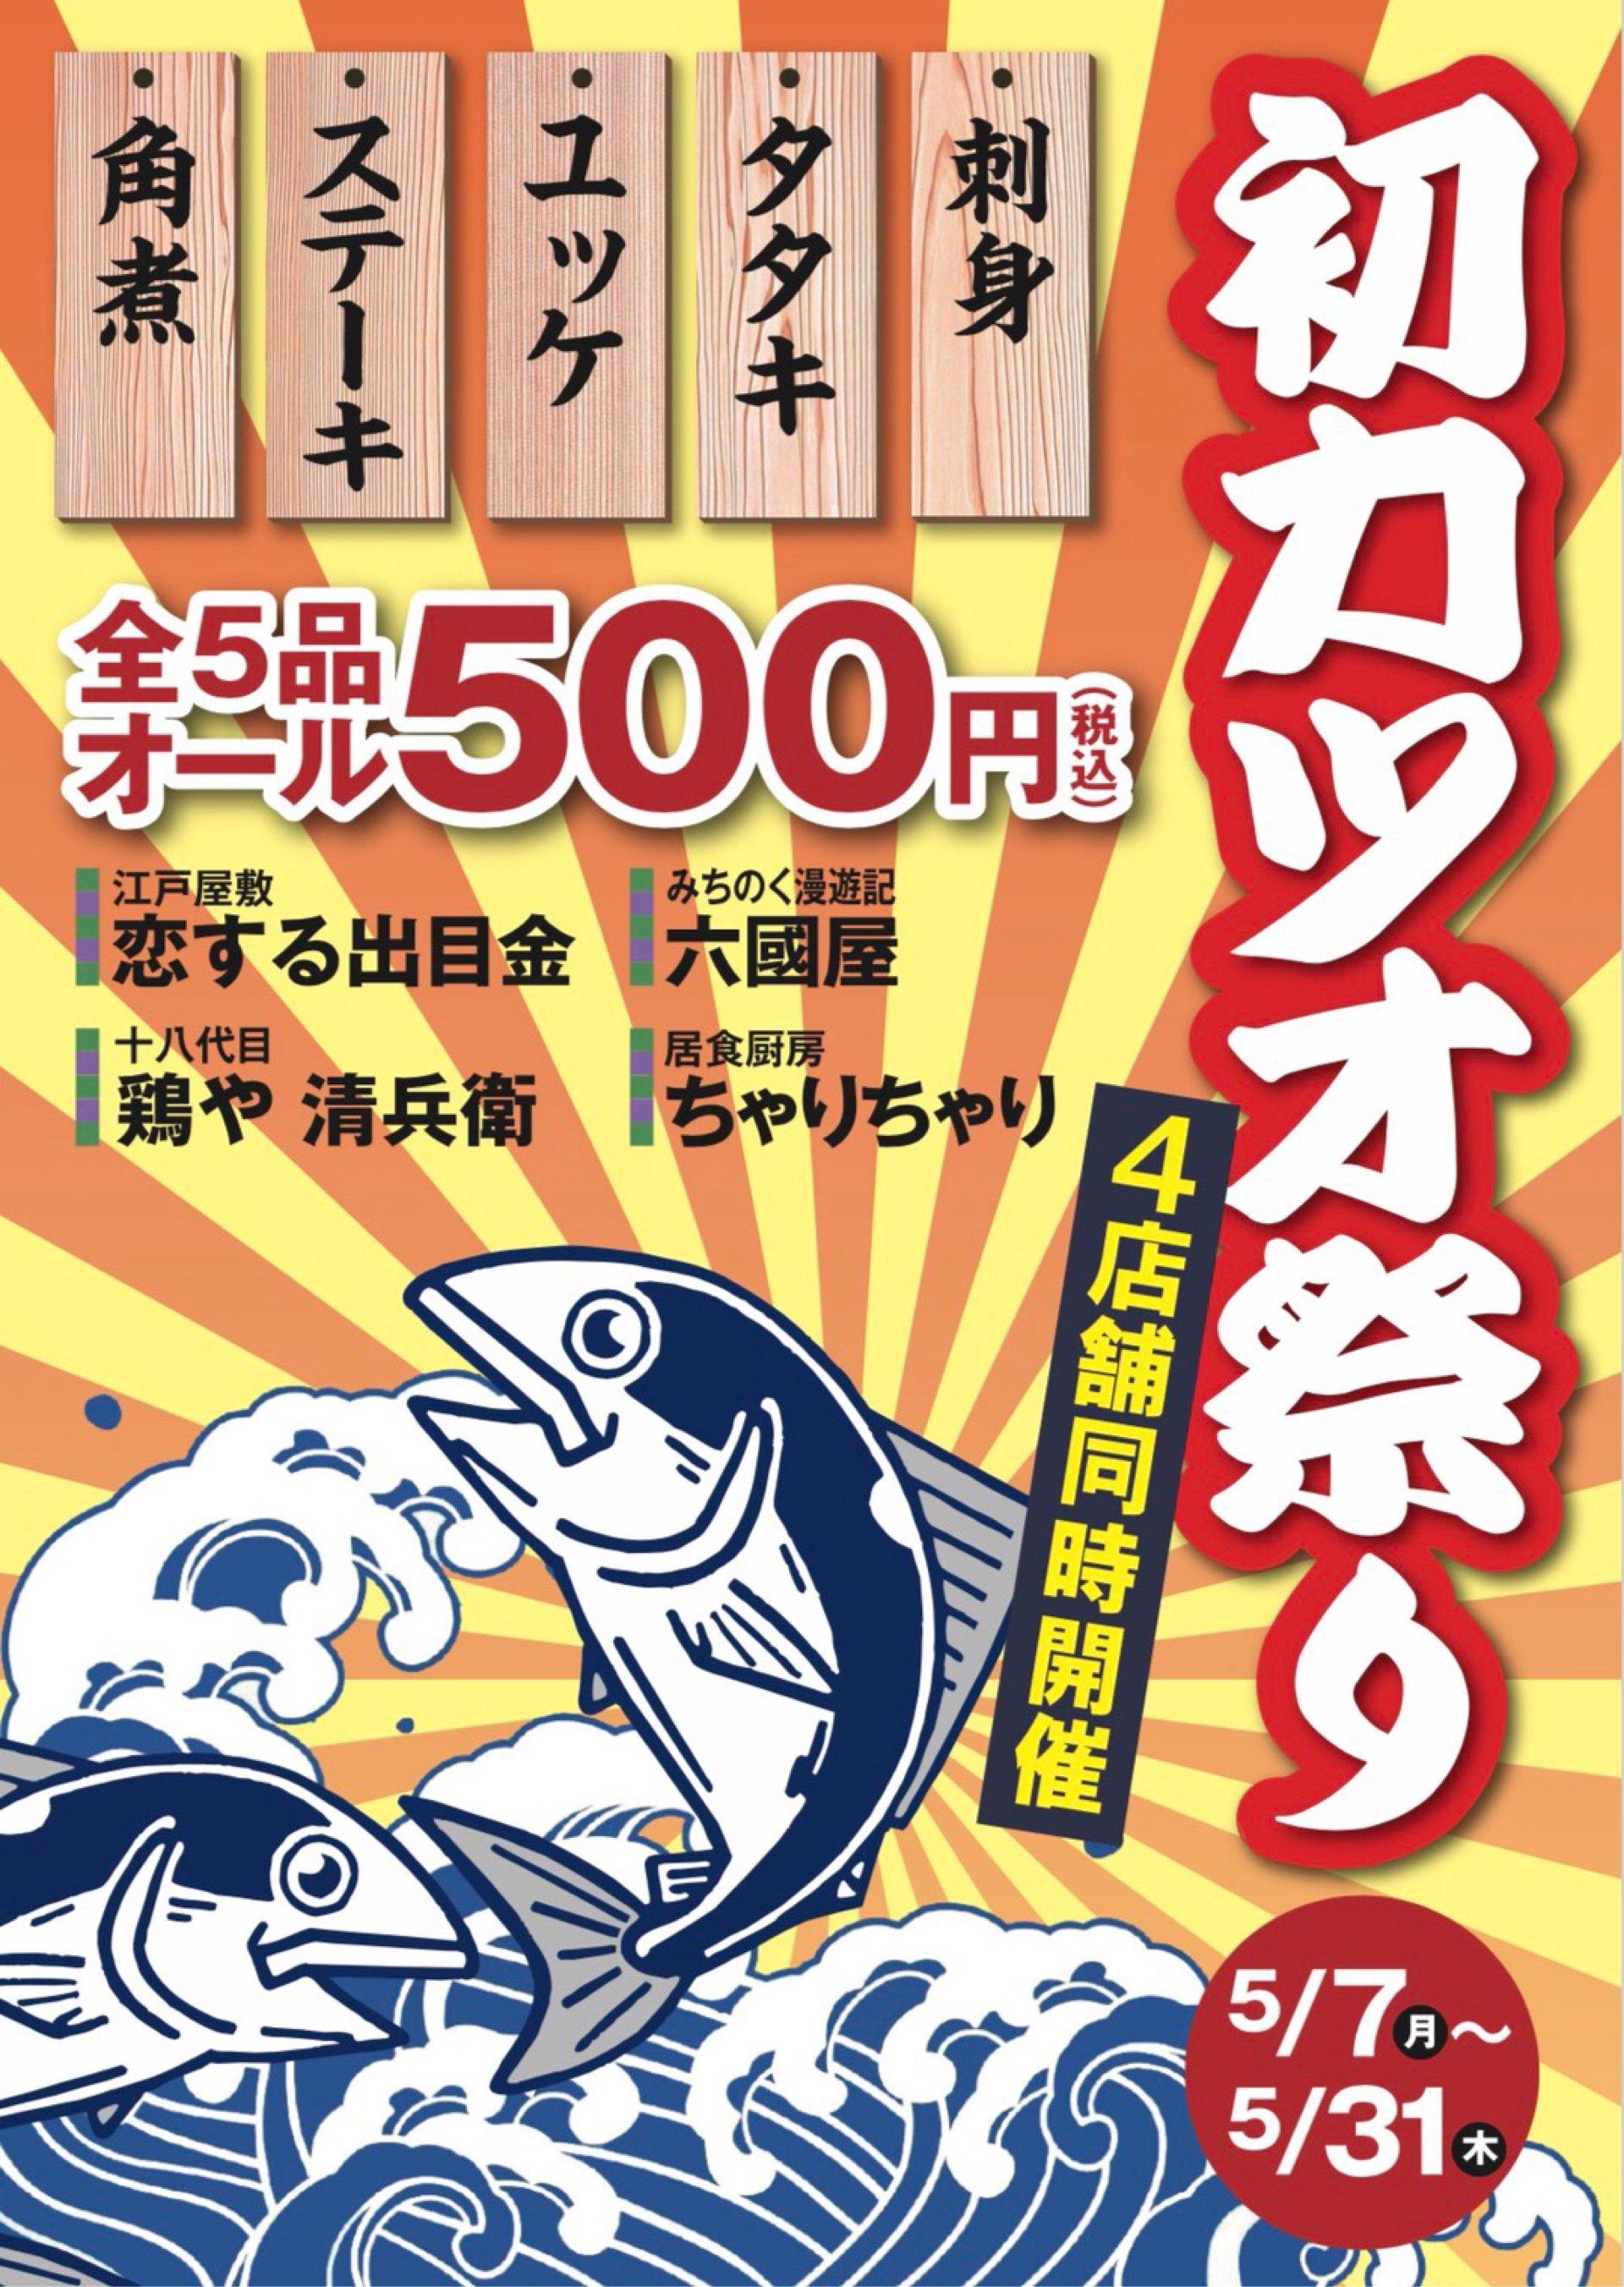 江戸屋敷 恋する出目金|公式HP・福島市・居酒屋・個室・駅チカ